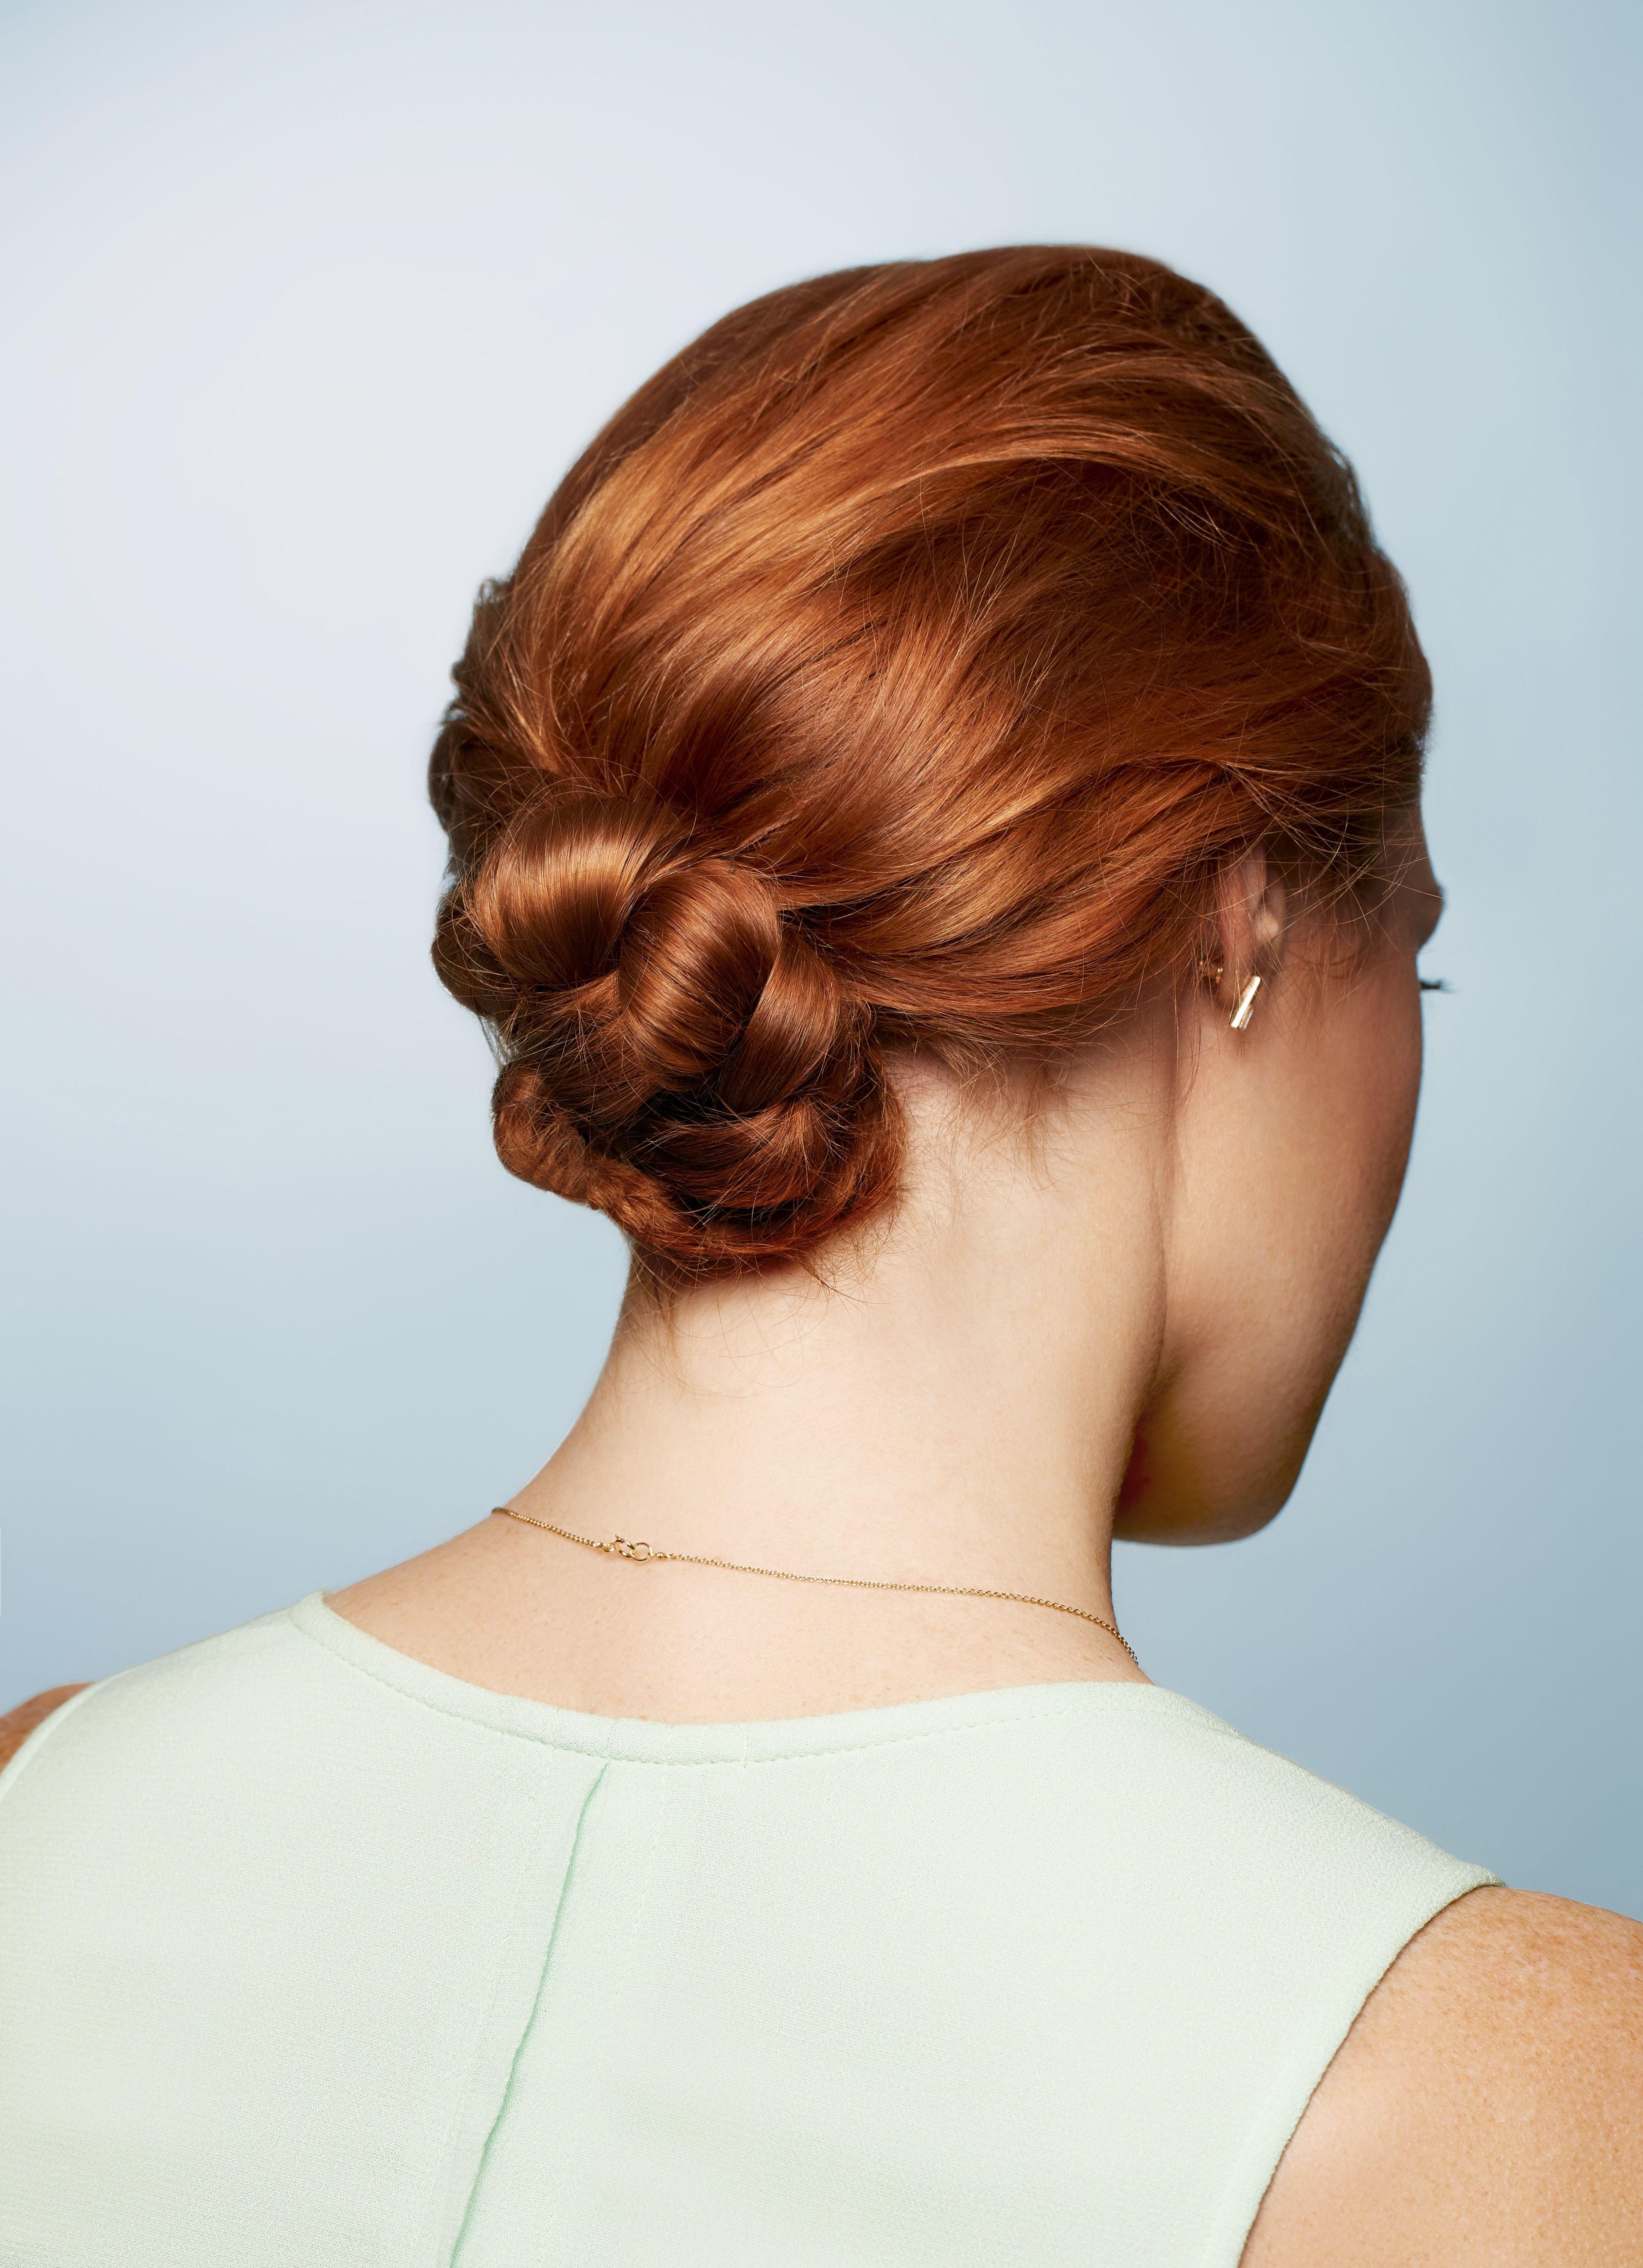 pics 5 Minute Fix: Freshen Up Dirty Hair